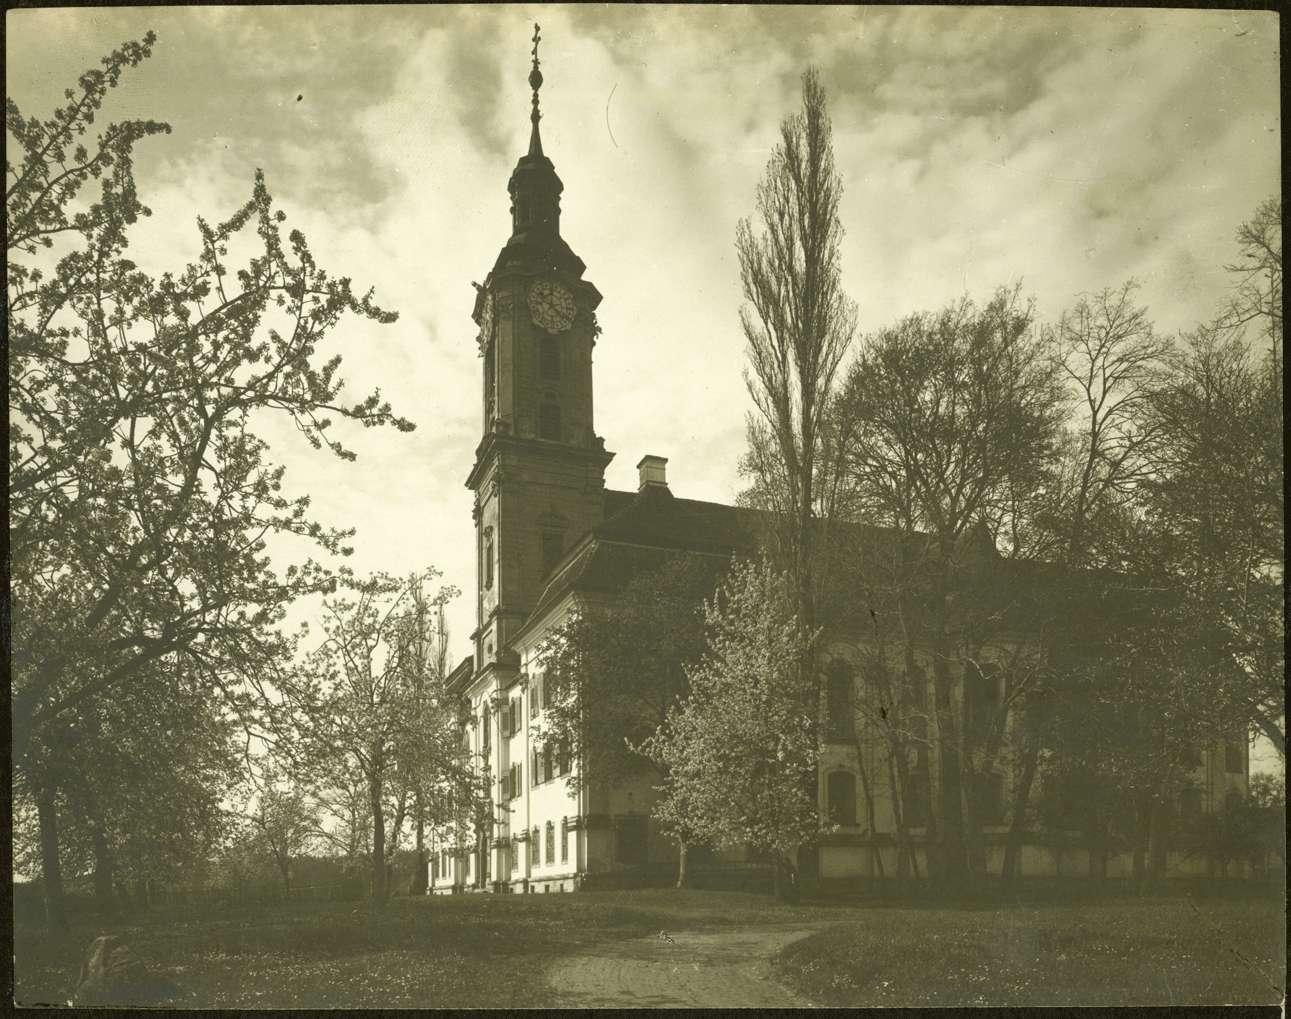 Wallfahrtskirche, Bild 1